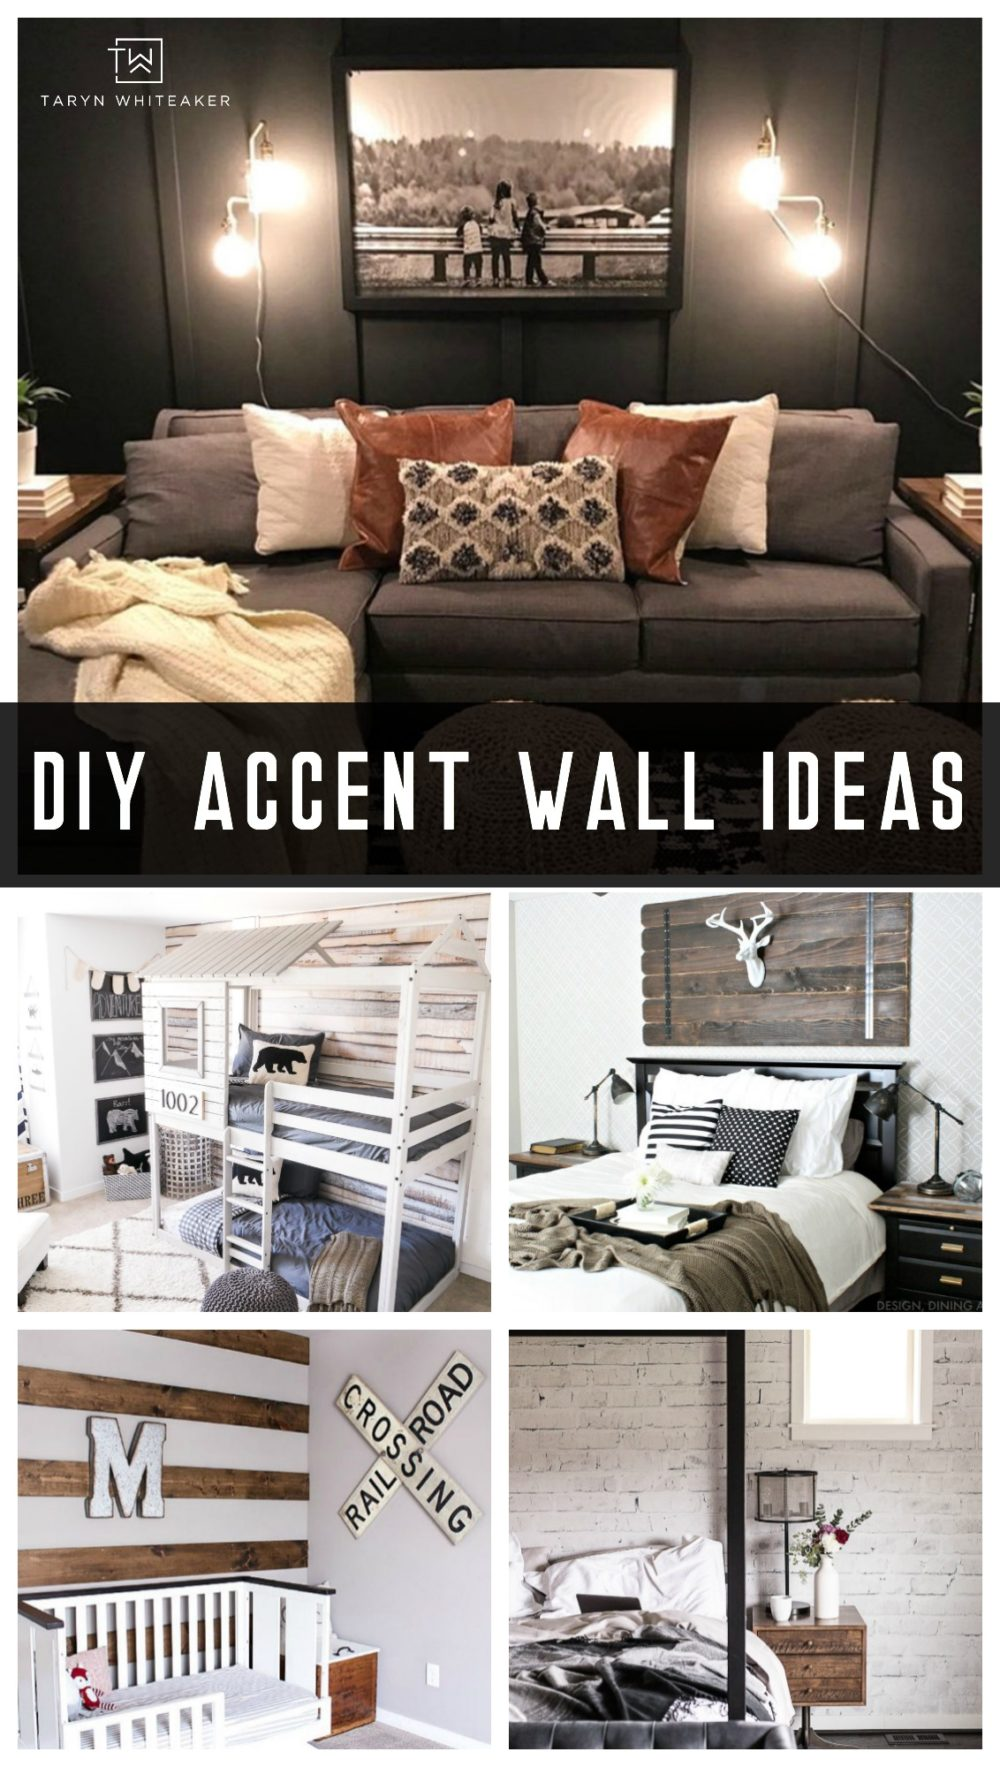 diy accent wall ideas taryn whiteaker in 2020 diy on accent wall ideas id=97440